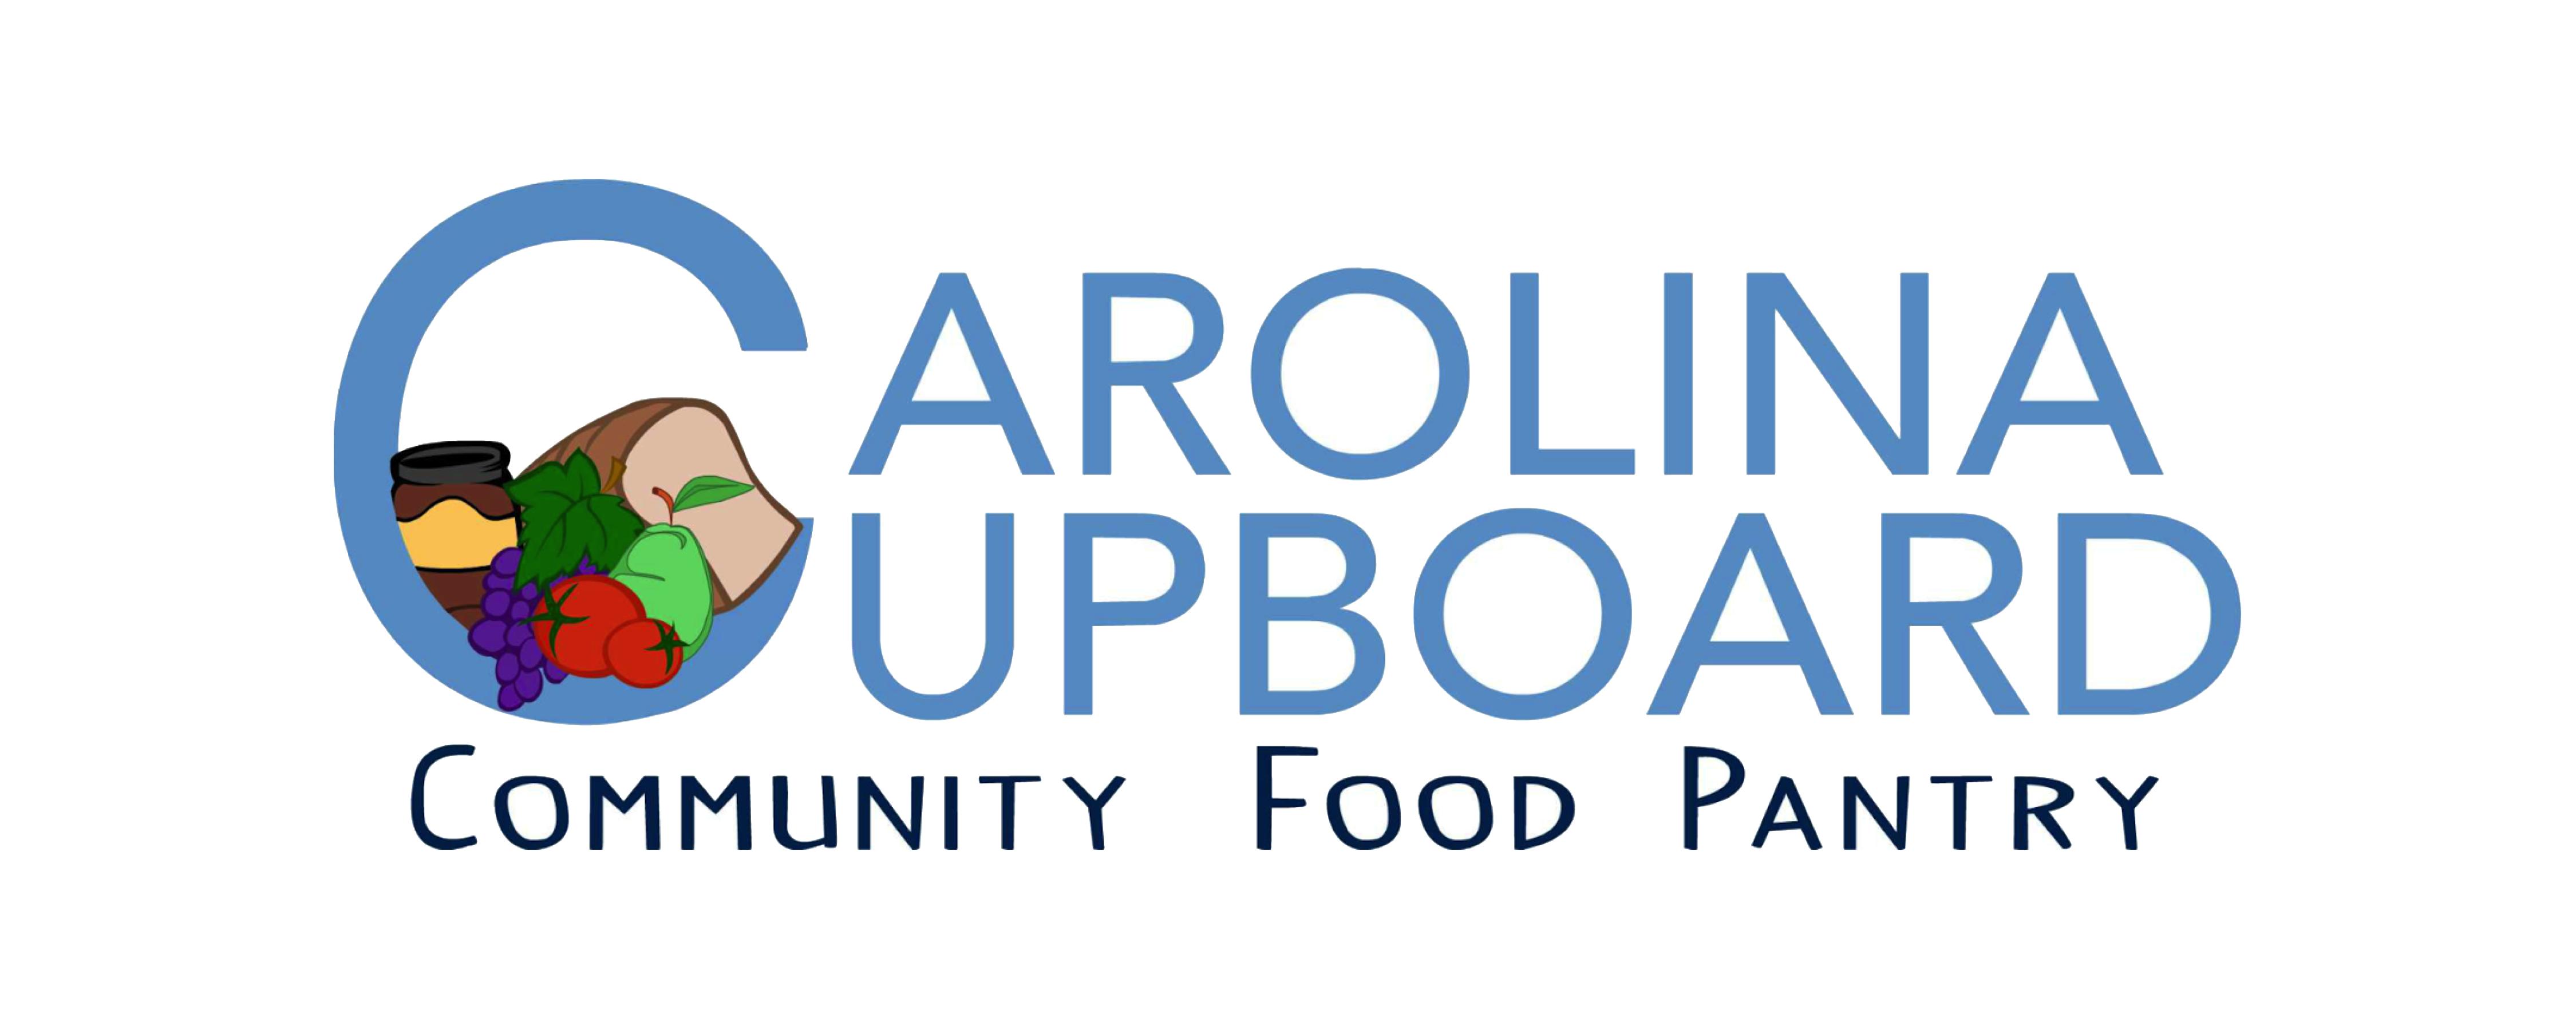 Carolina Cupboard